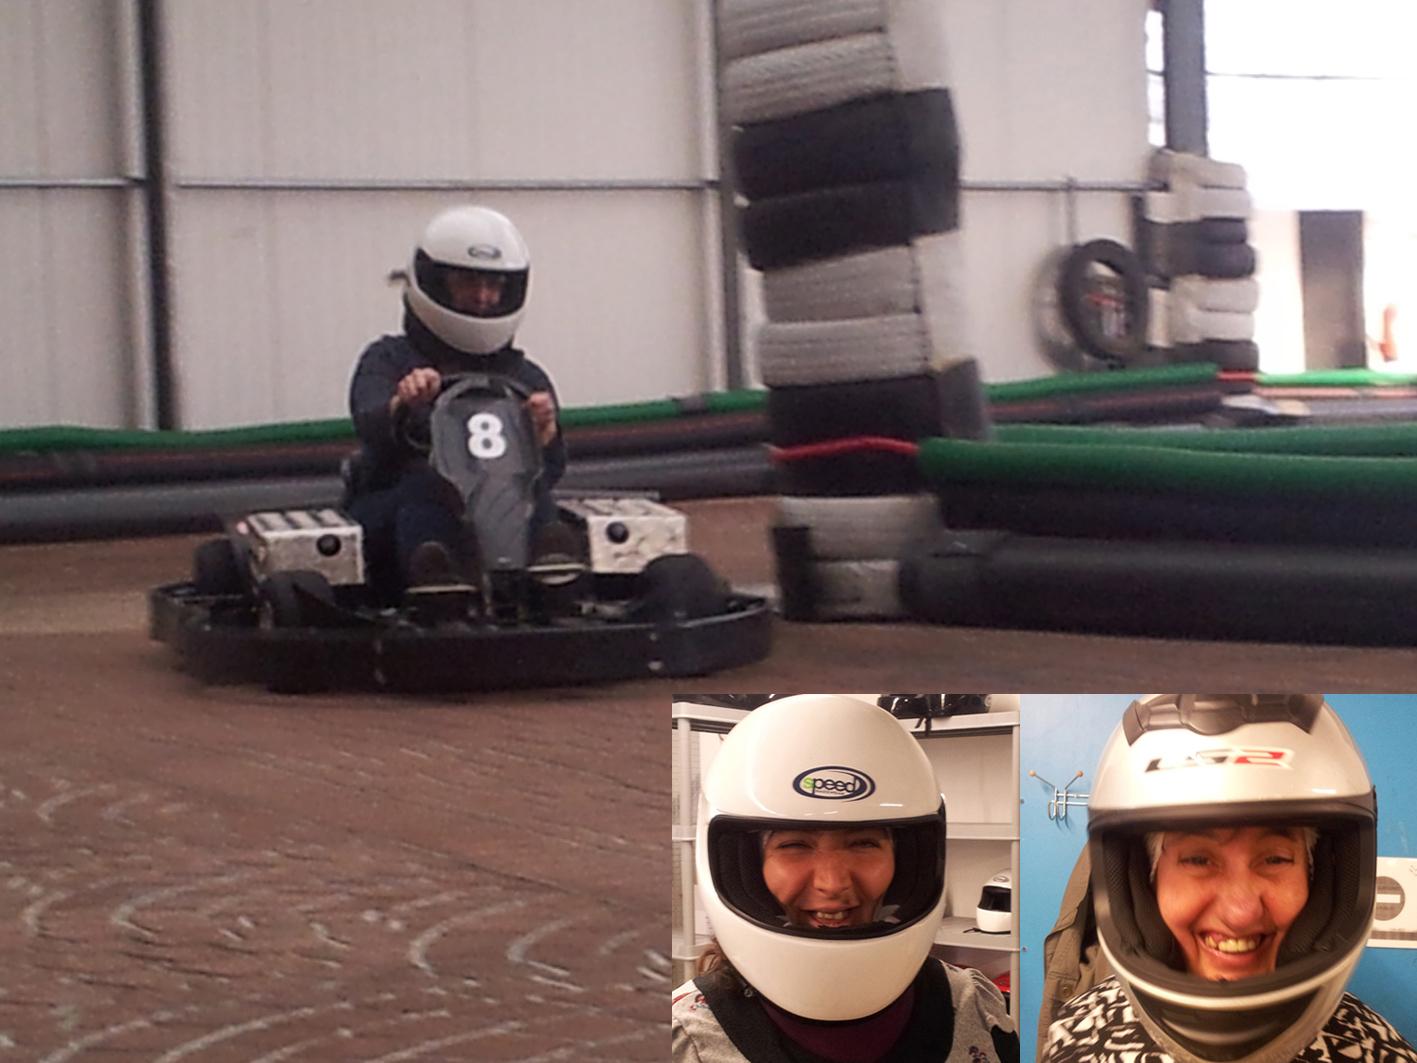 karting castres kart 39 in family karting castres youtube le karting sur glace fait son entr e. Black Bedroom Furniture Sets. Home Design Ideas